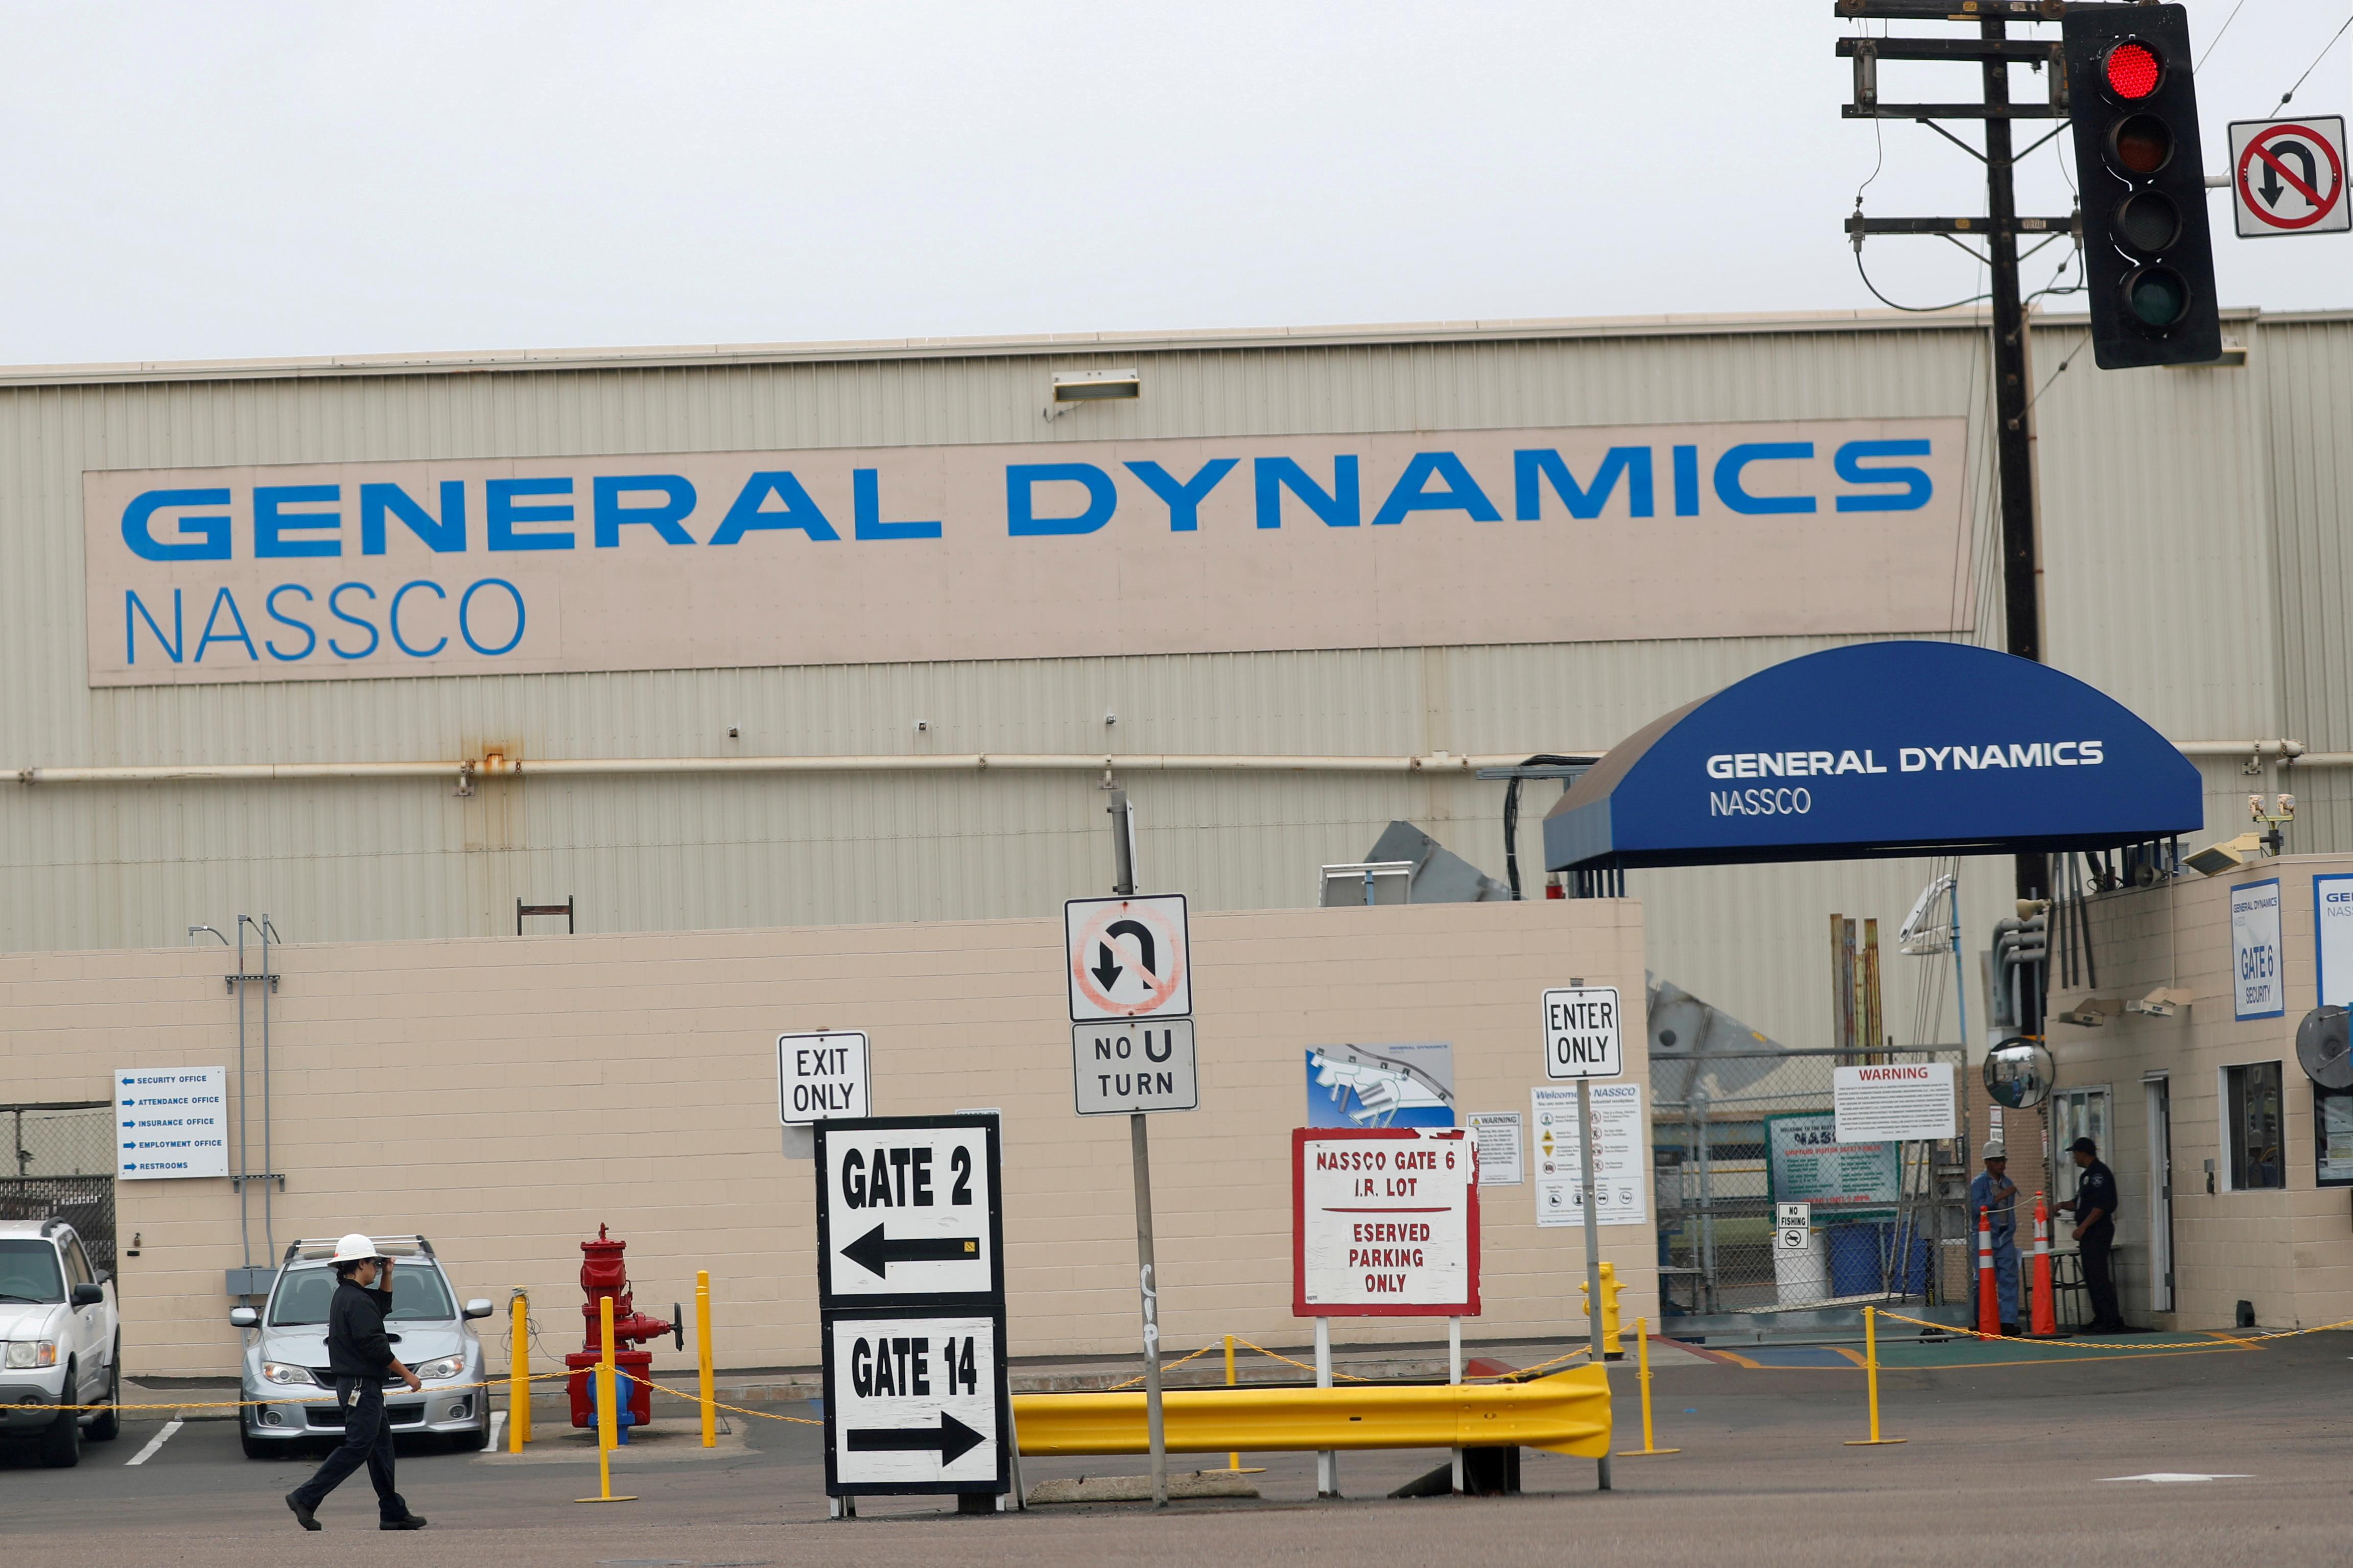 A General Dynamics NASSCO ship yard entrance is shown in San Diego, California, U.S., June 17, 2019. REUTERS/Mike Blake/File Photo